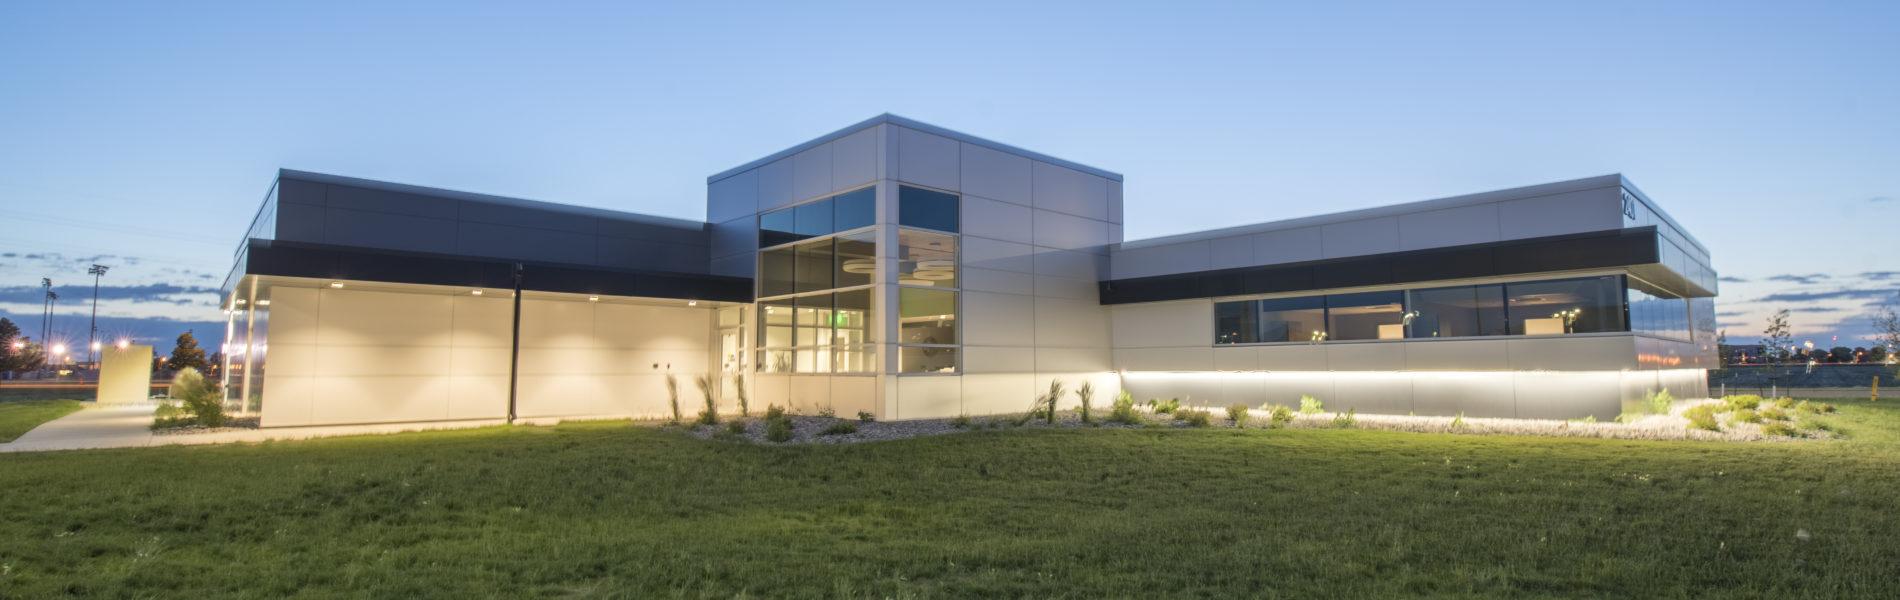 Home Center For Pain Medicine P A